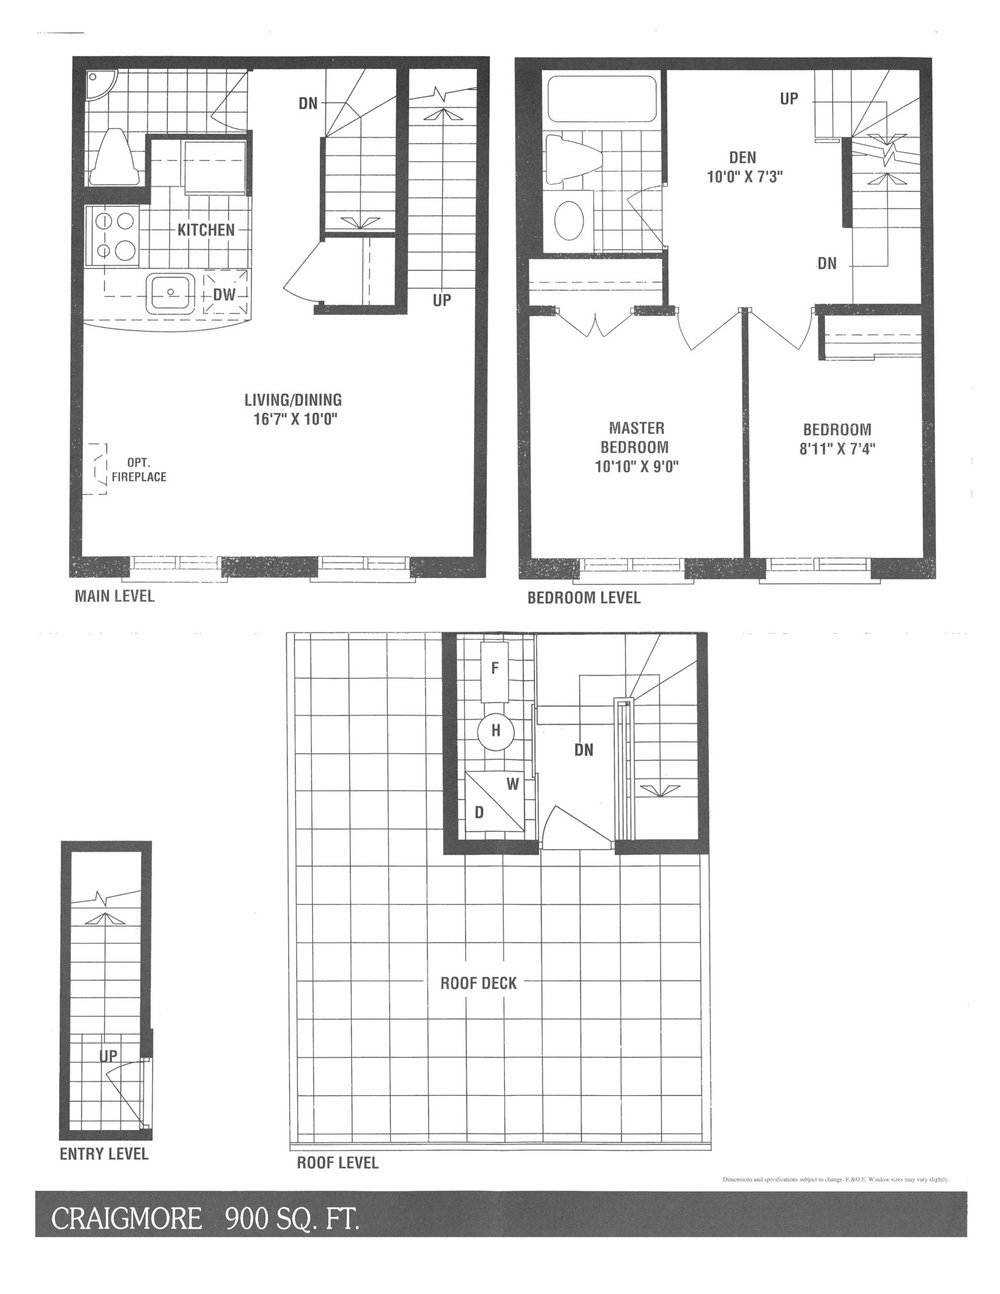 Craigmore  Floor plan 900 sqft.jpg